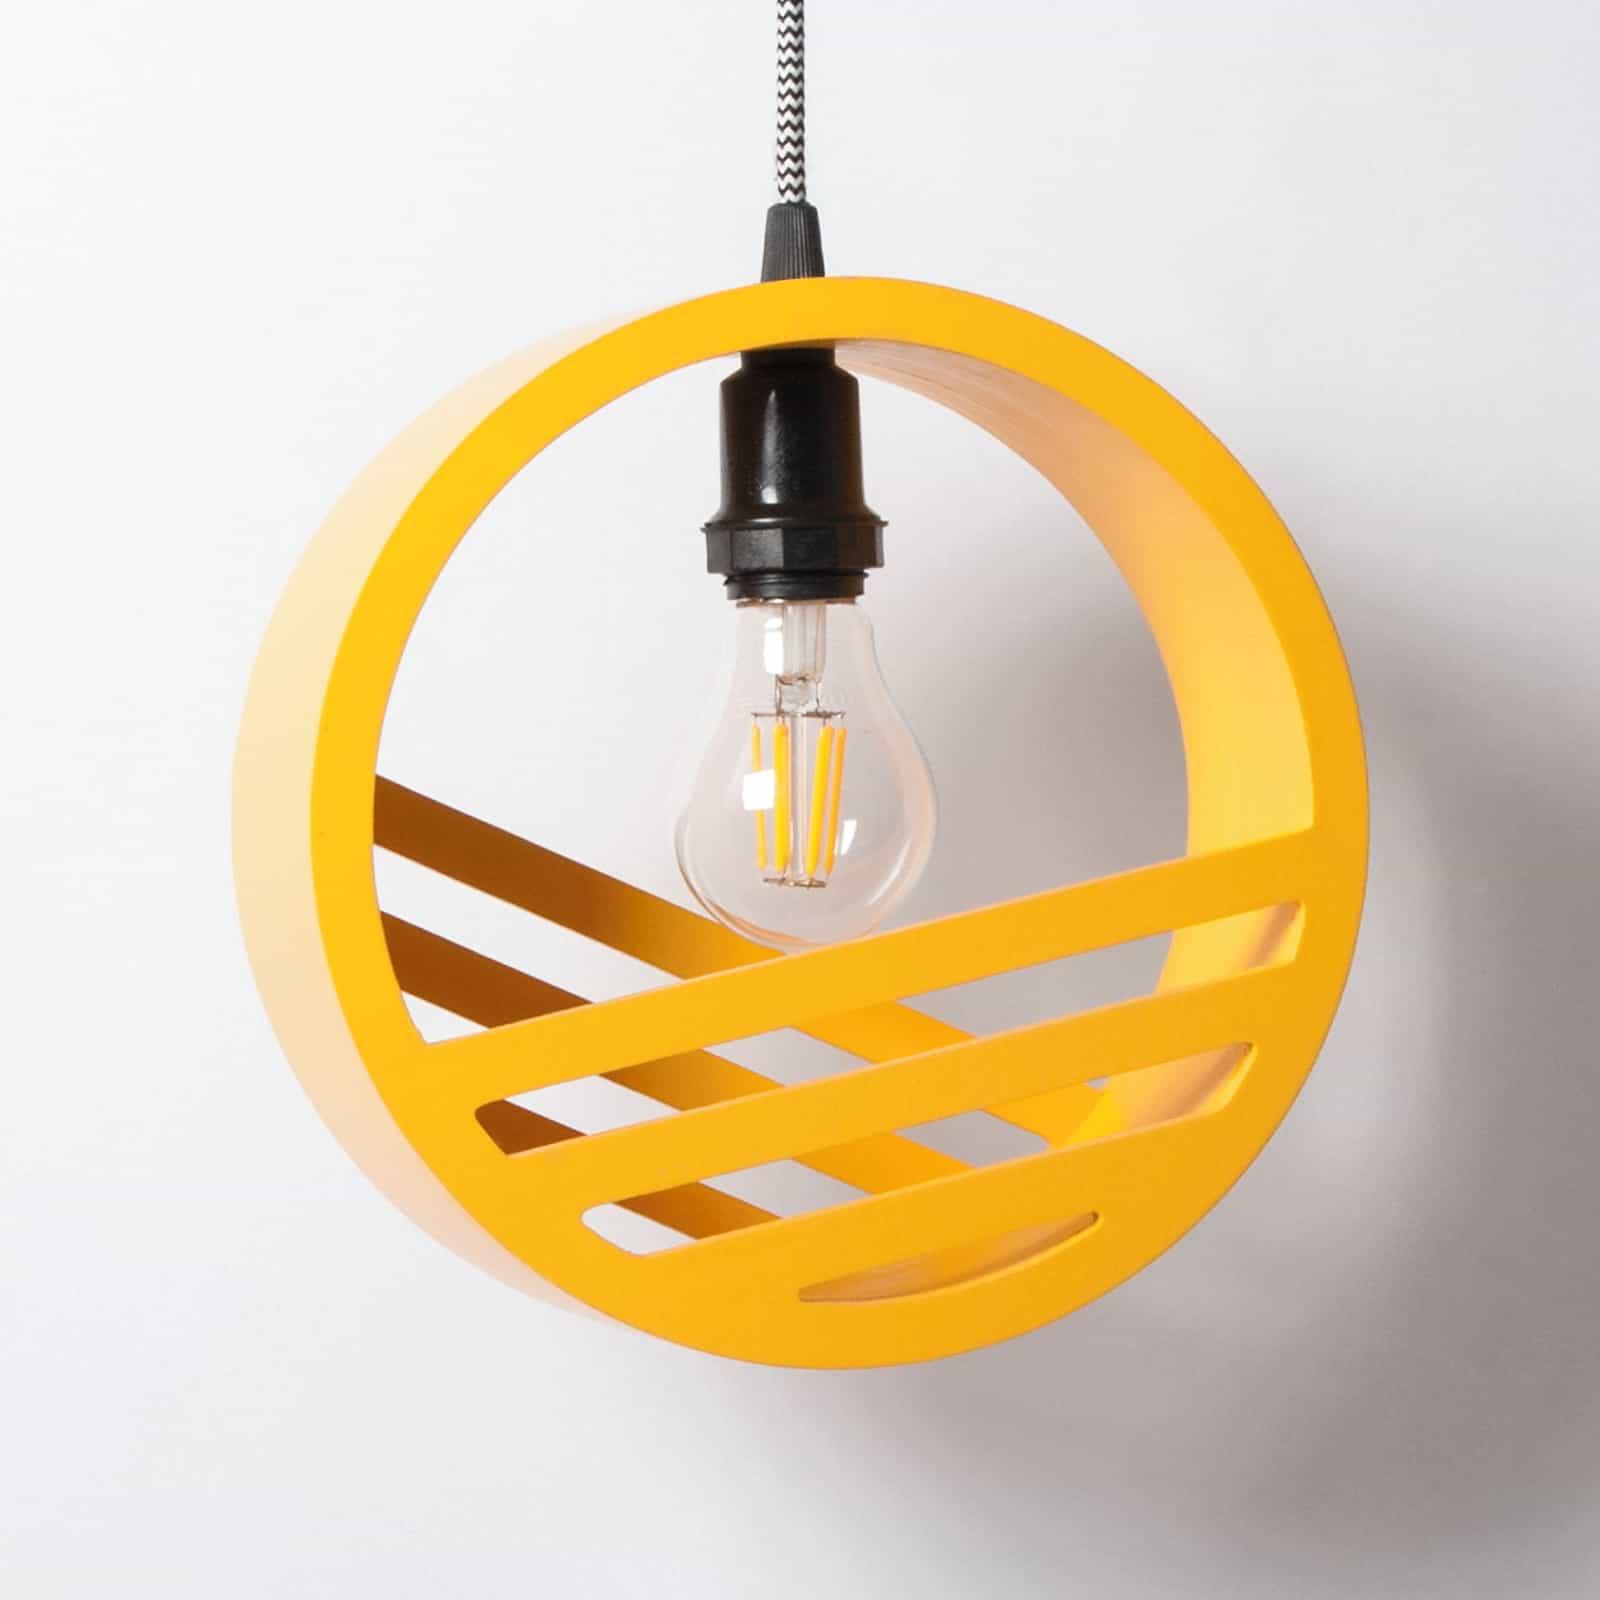 Lâmpada com entorno circular